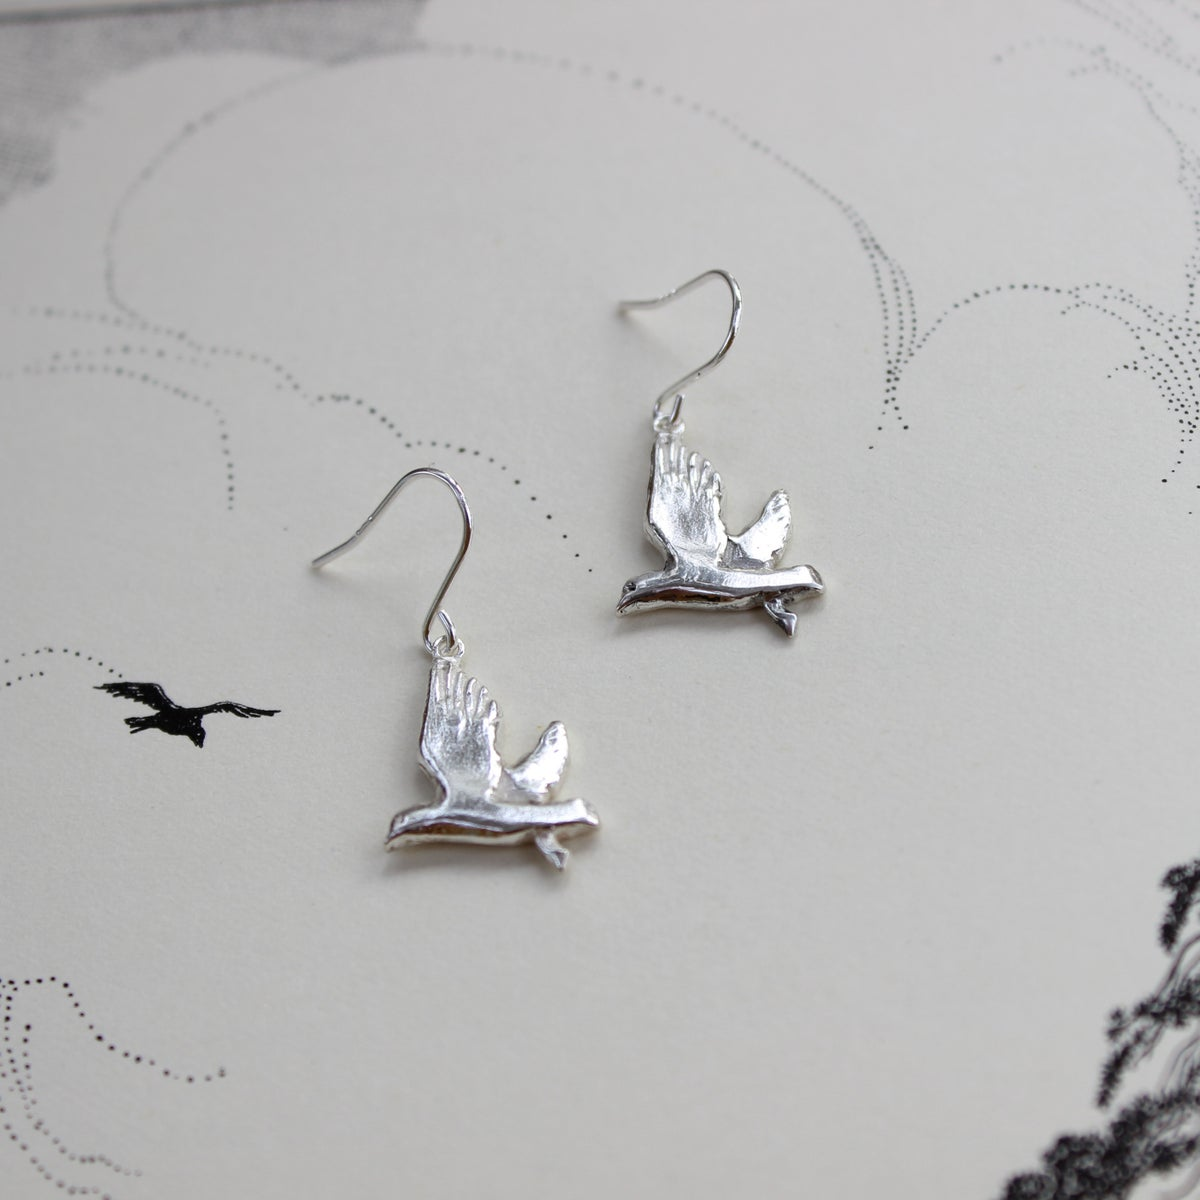 Image of seagull earrings